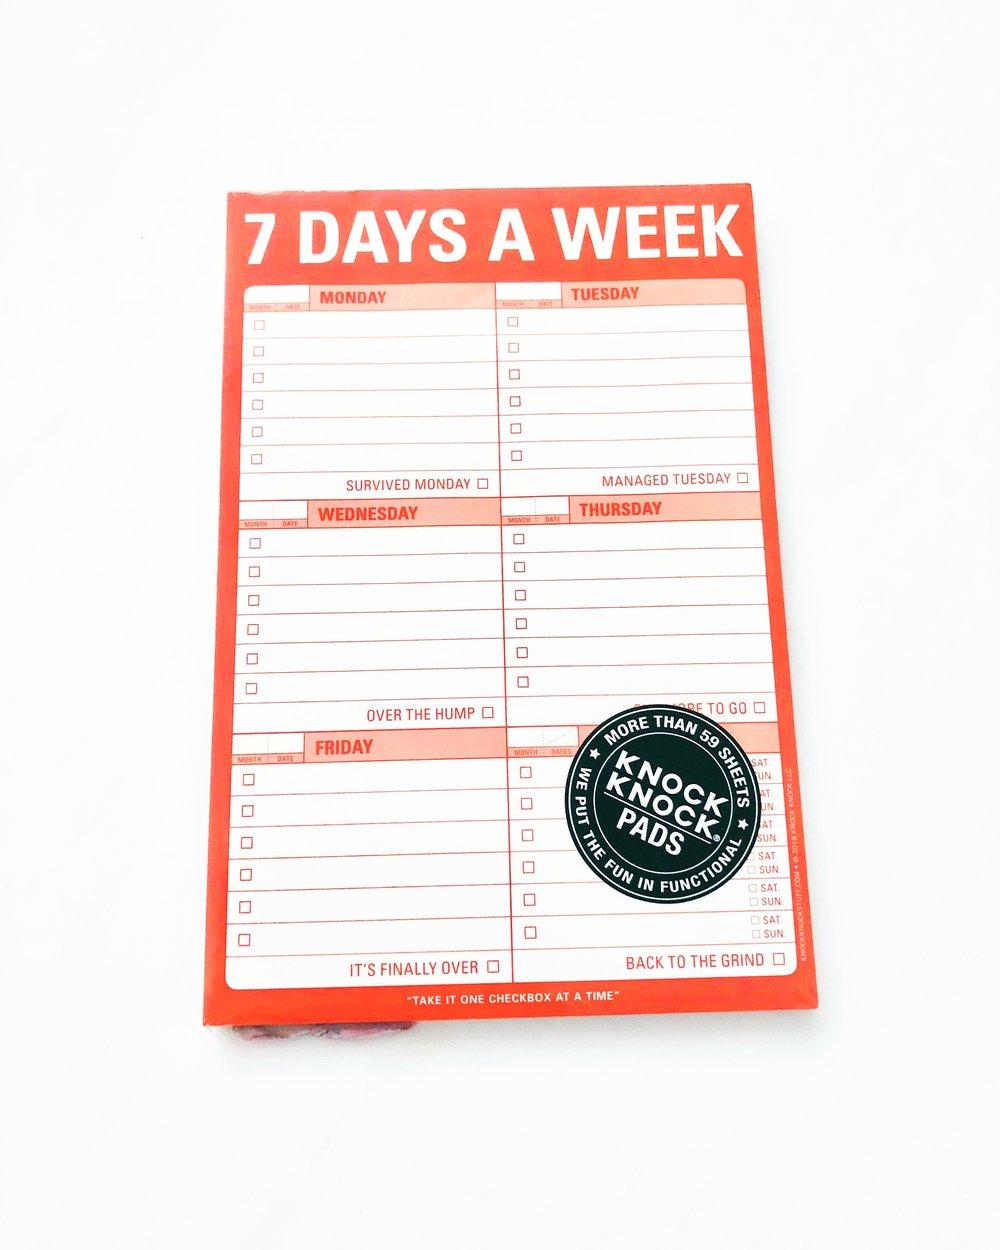 Cmid   Christy Maingot Interior Design  7 Days A Week Planner intended for 7 Days A Week Planner